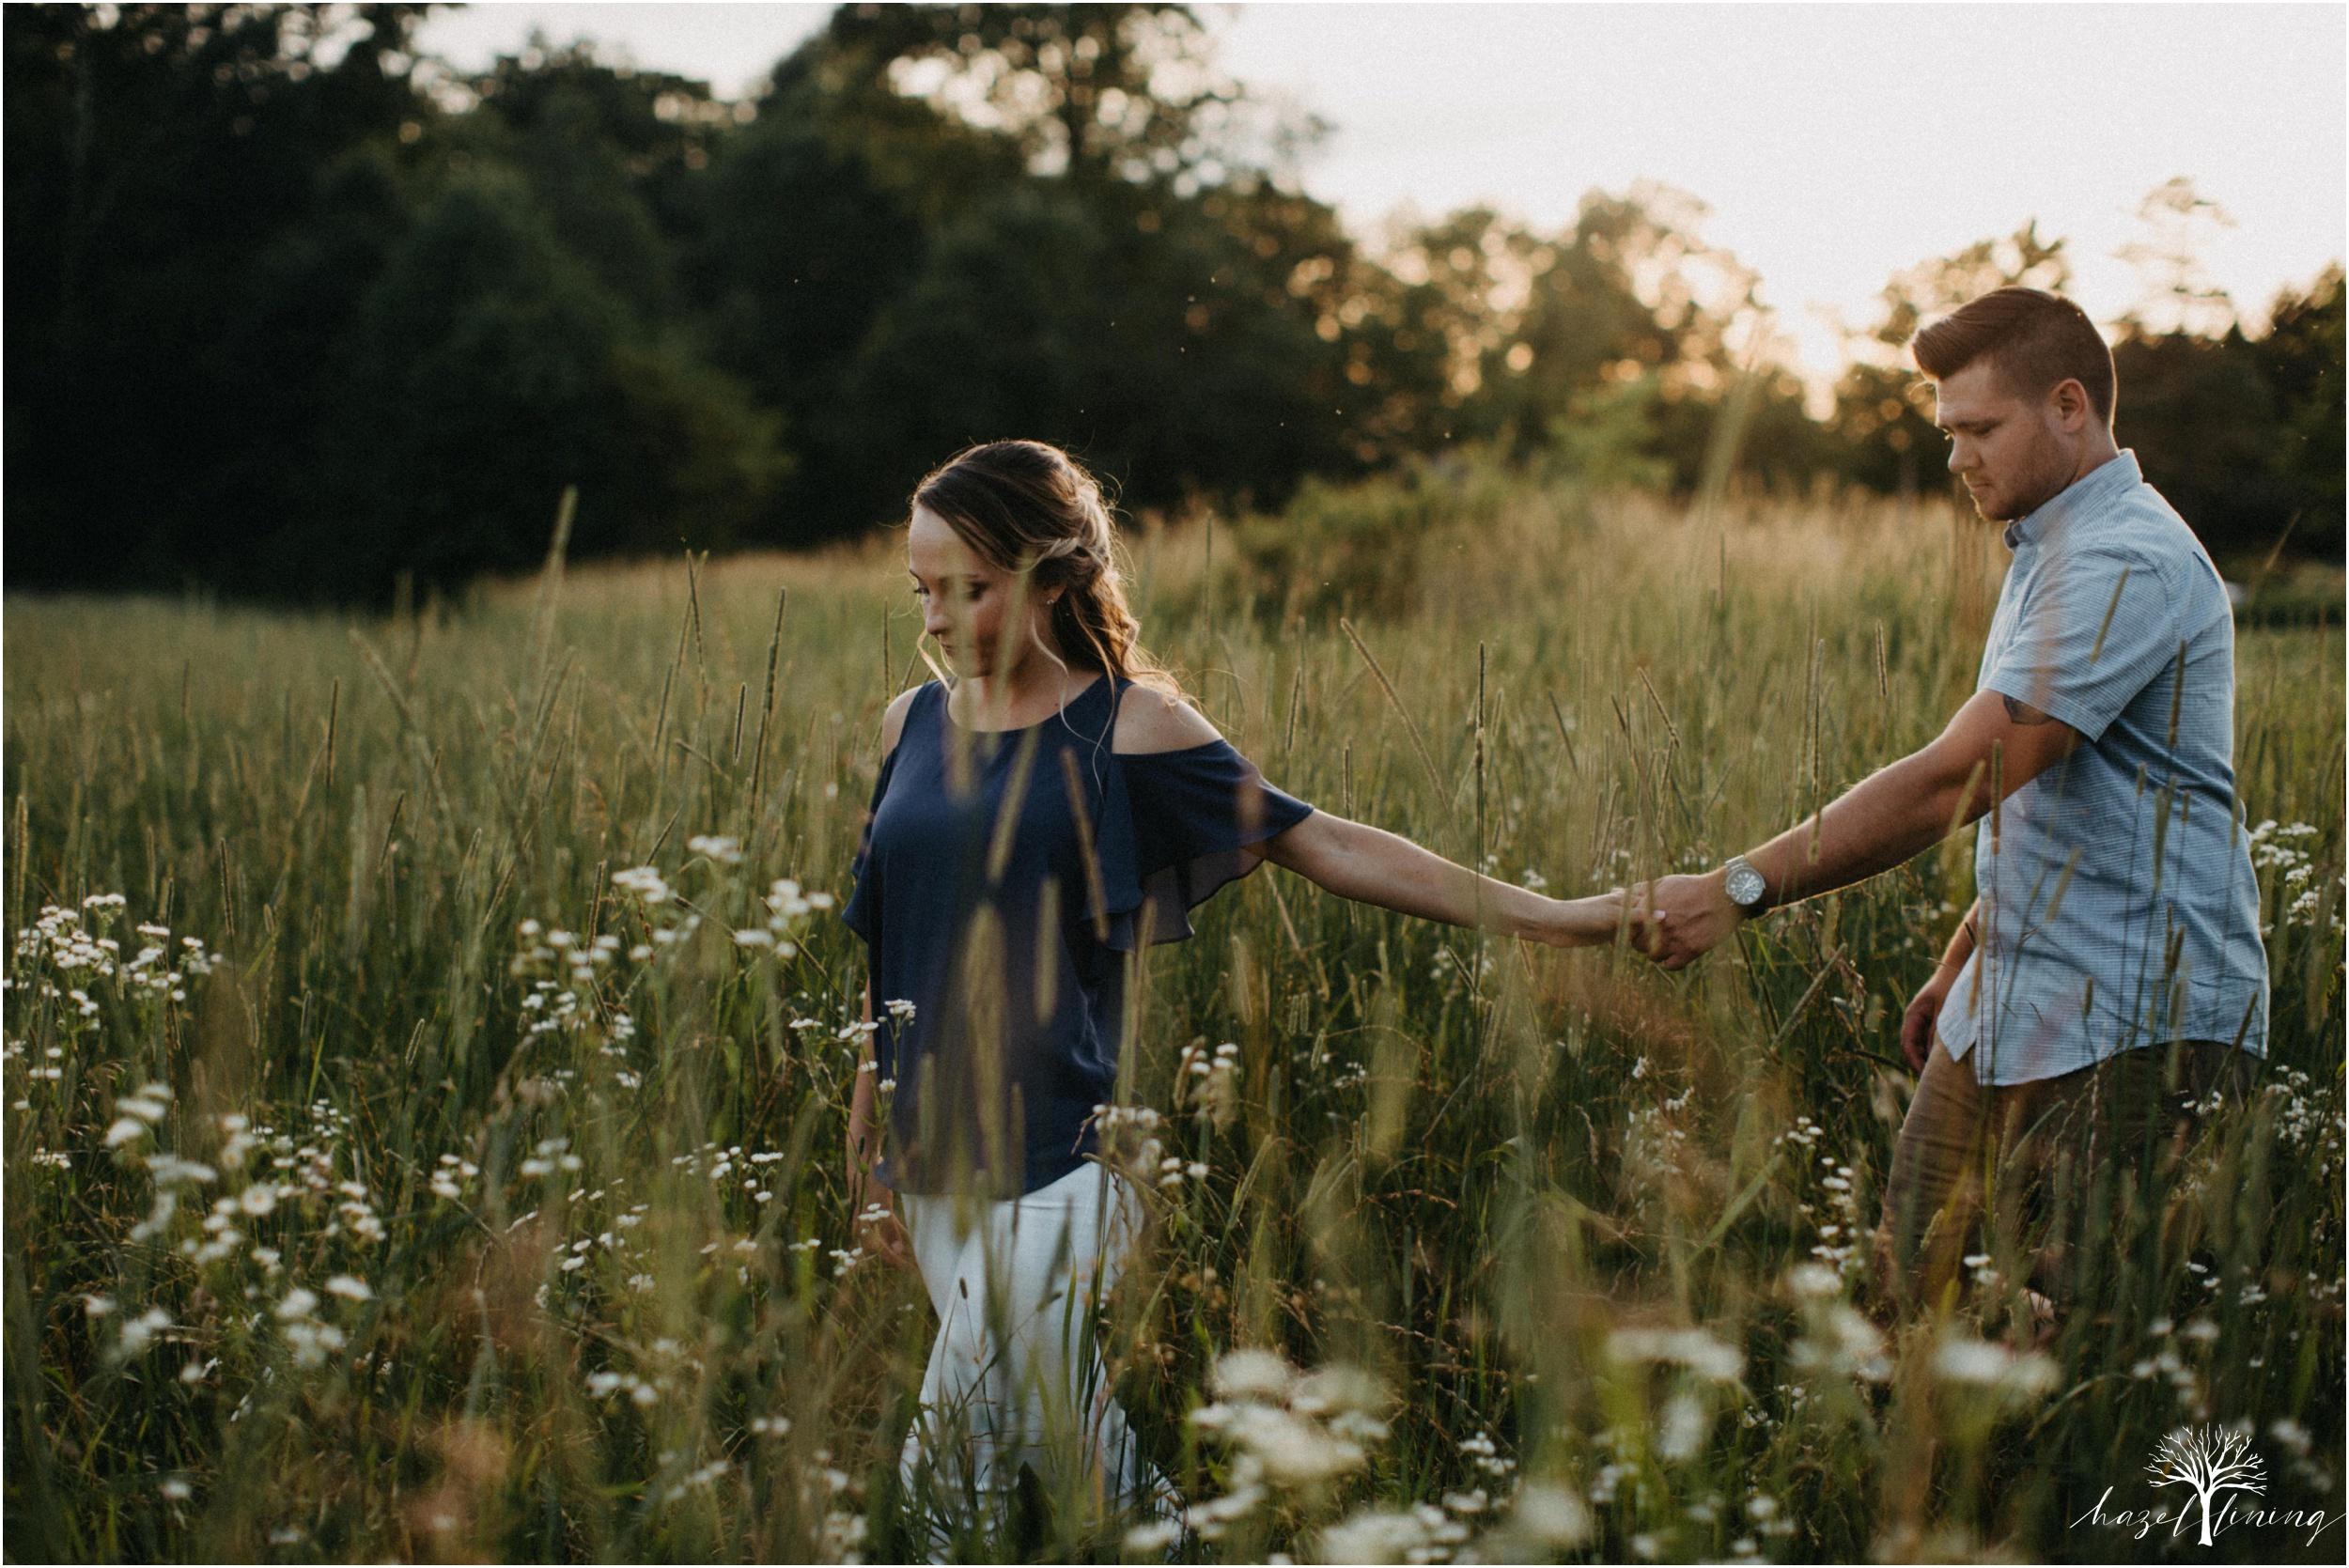 rachel-warner-chris-niedrist-the-farm-bakery-and-events-quakertown-pa-summer-engagement-hazel-lining-photography-destination-elopement-wedding-engagement-photography_0037.jpg